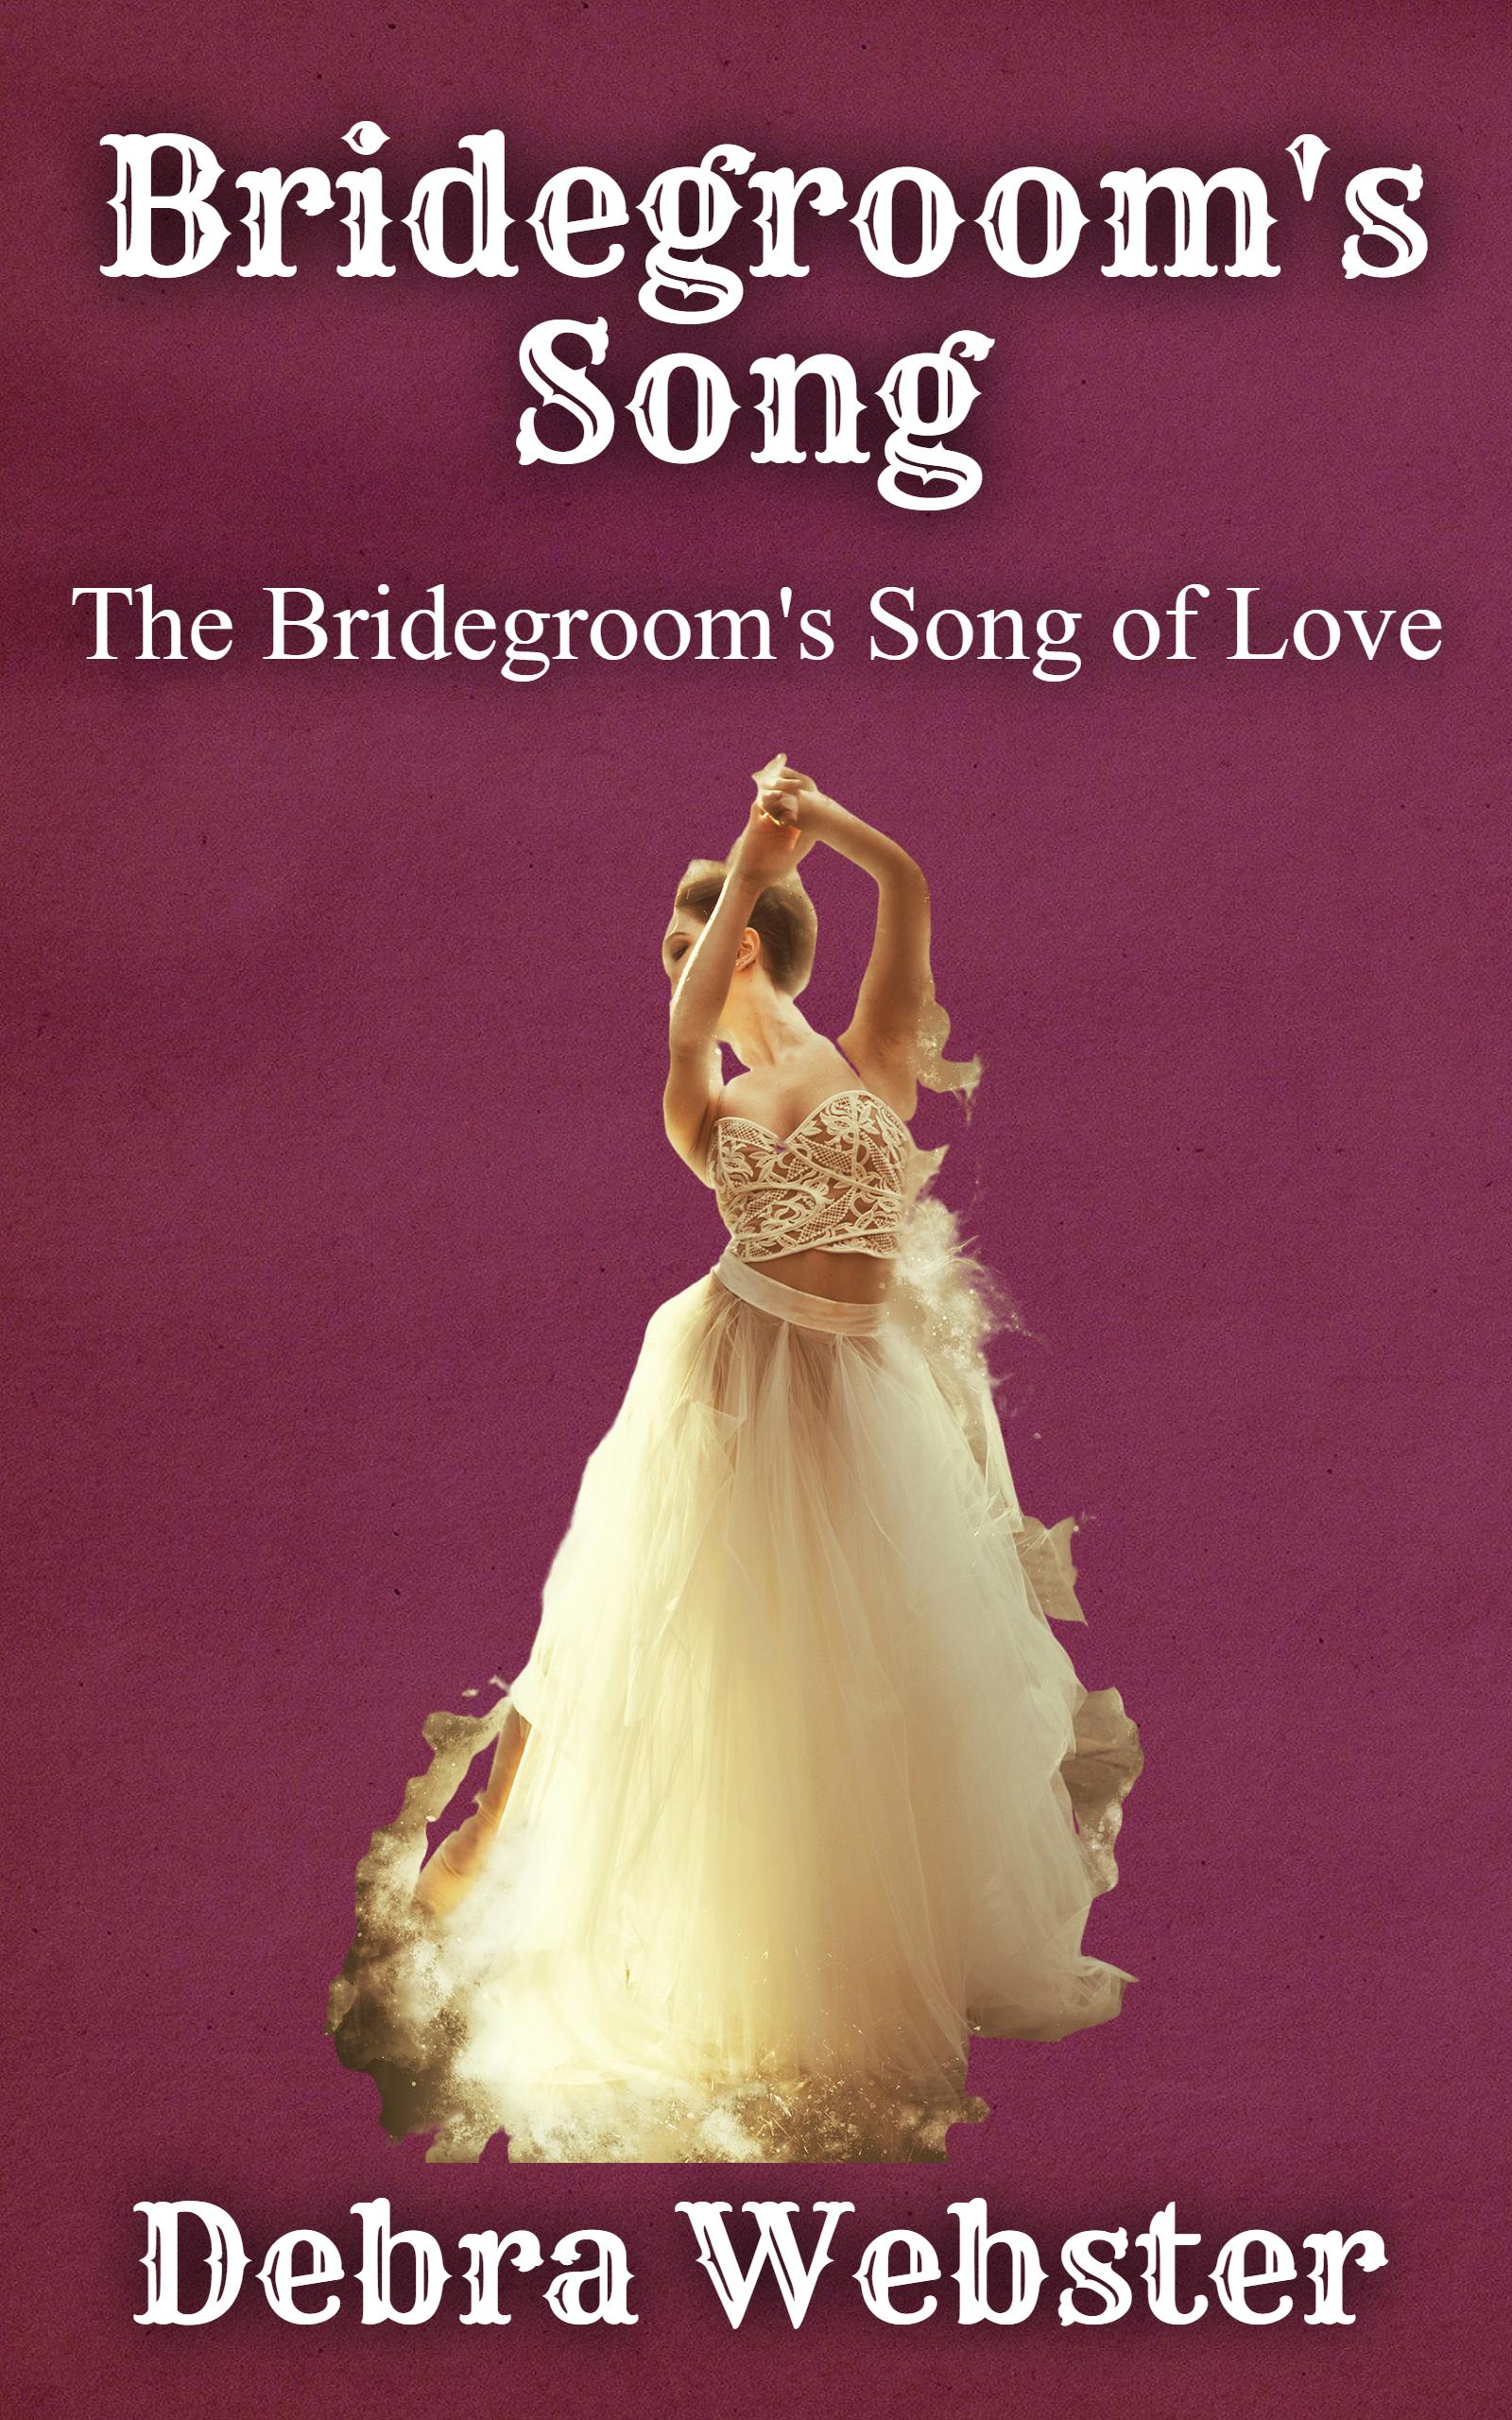 Books - image BookBrushImage-2020-1-24-19-568-purple-2-kindle-bg-song on https://debrawebster.org